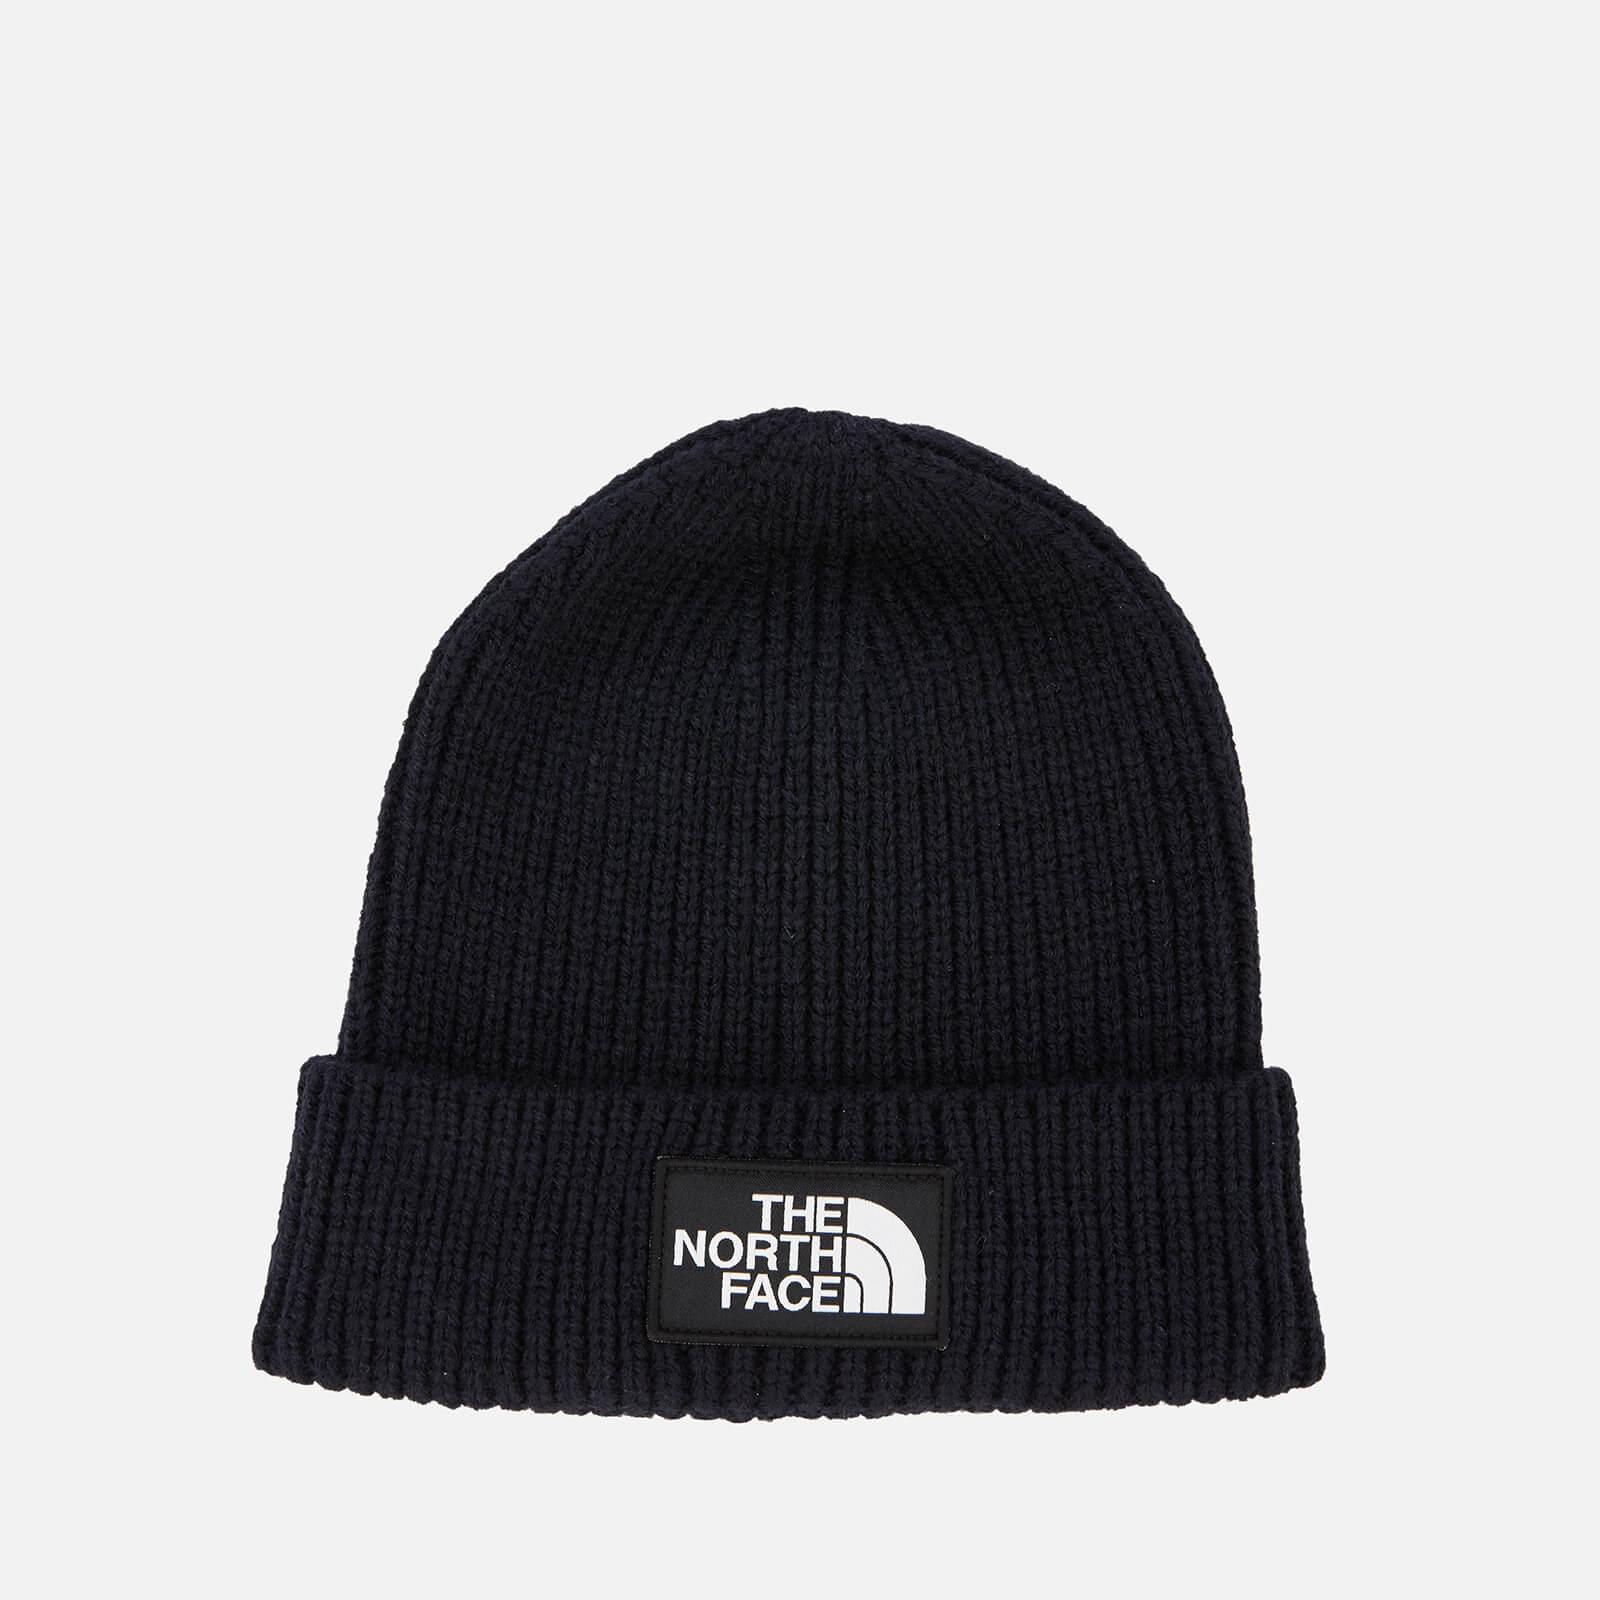 The North Face Men's Logo Box Cuffed Beanie Hat - Urban Navy